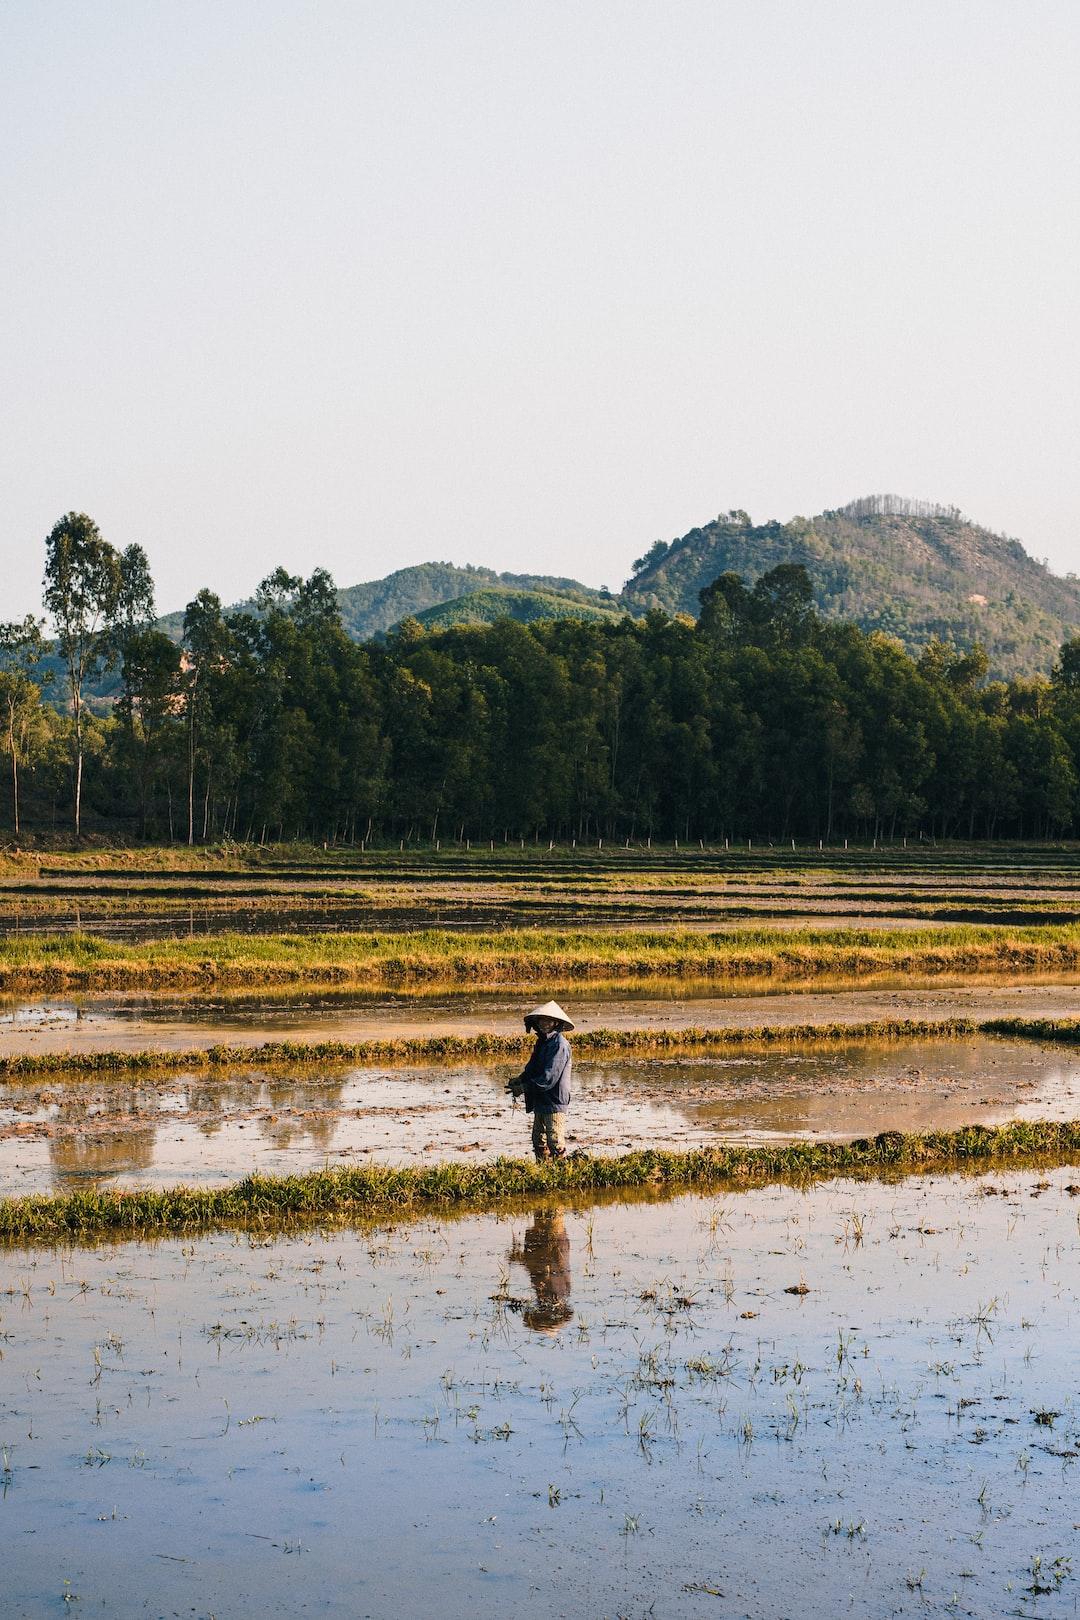 Worker in a rice field near Hoi An, Vietnam.